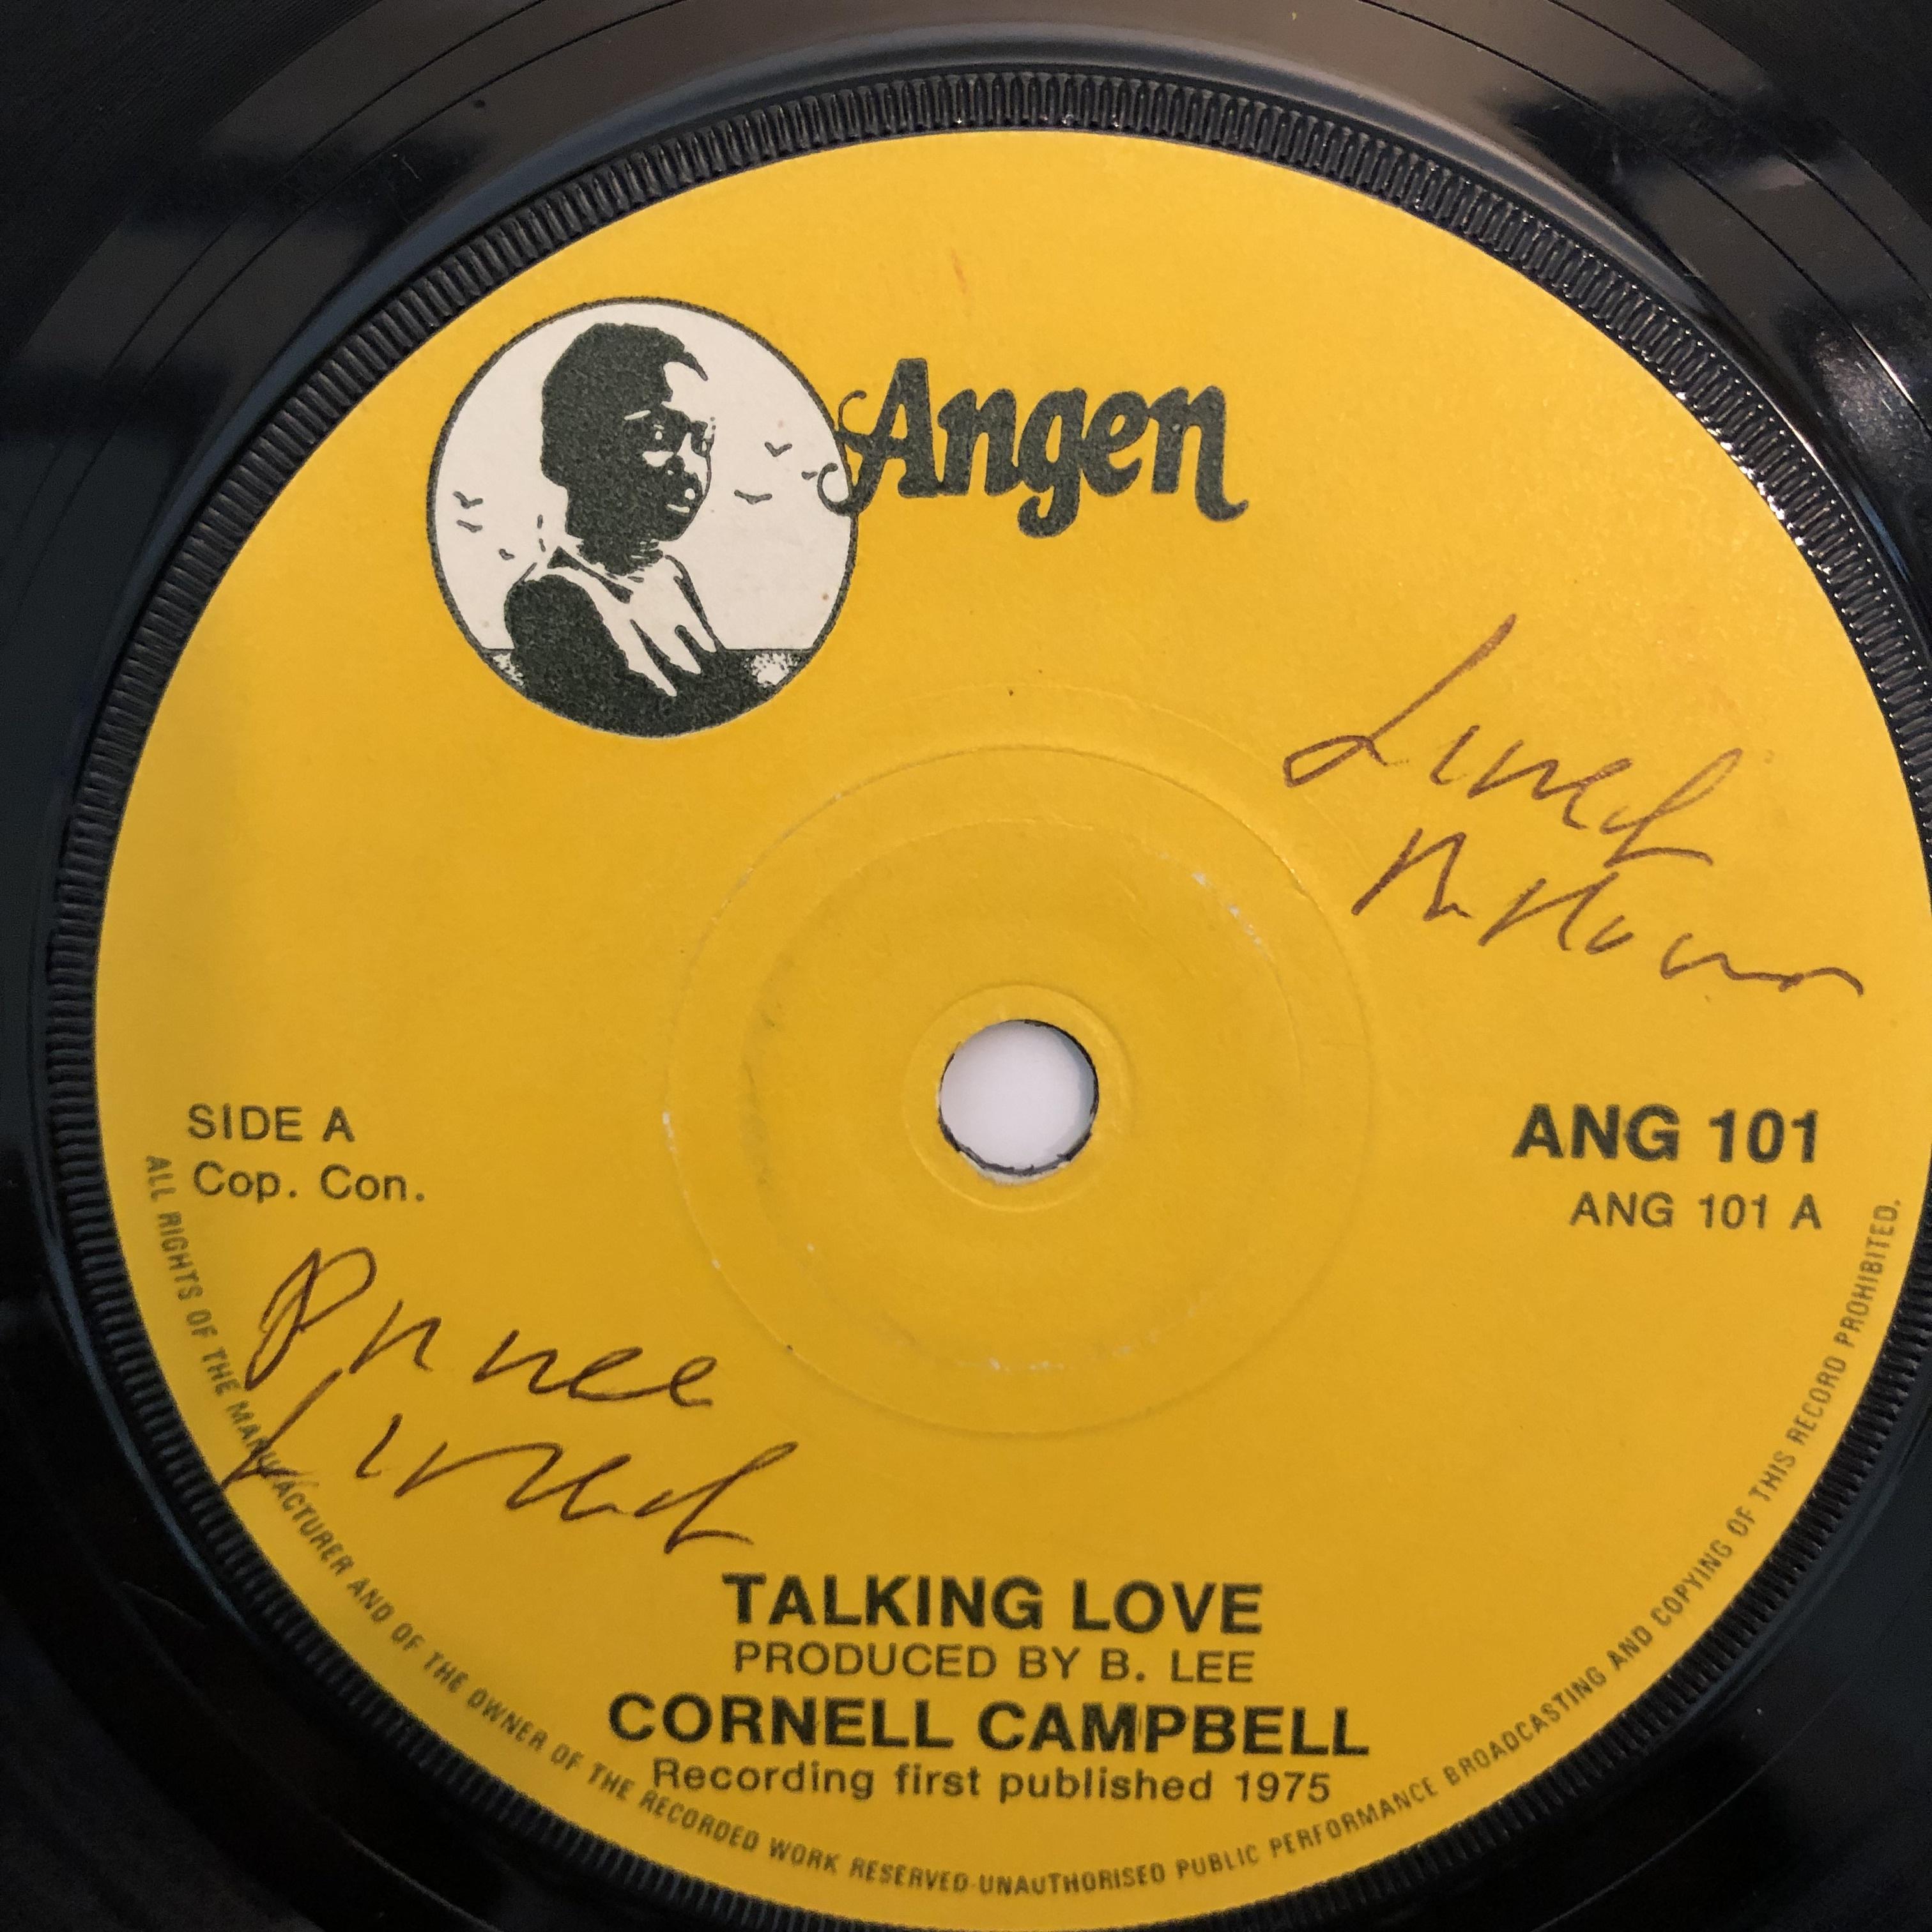 Cornell Campbell - Talking Love【7-20308】